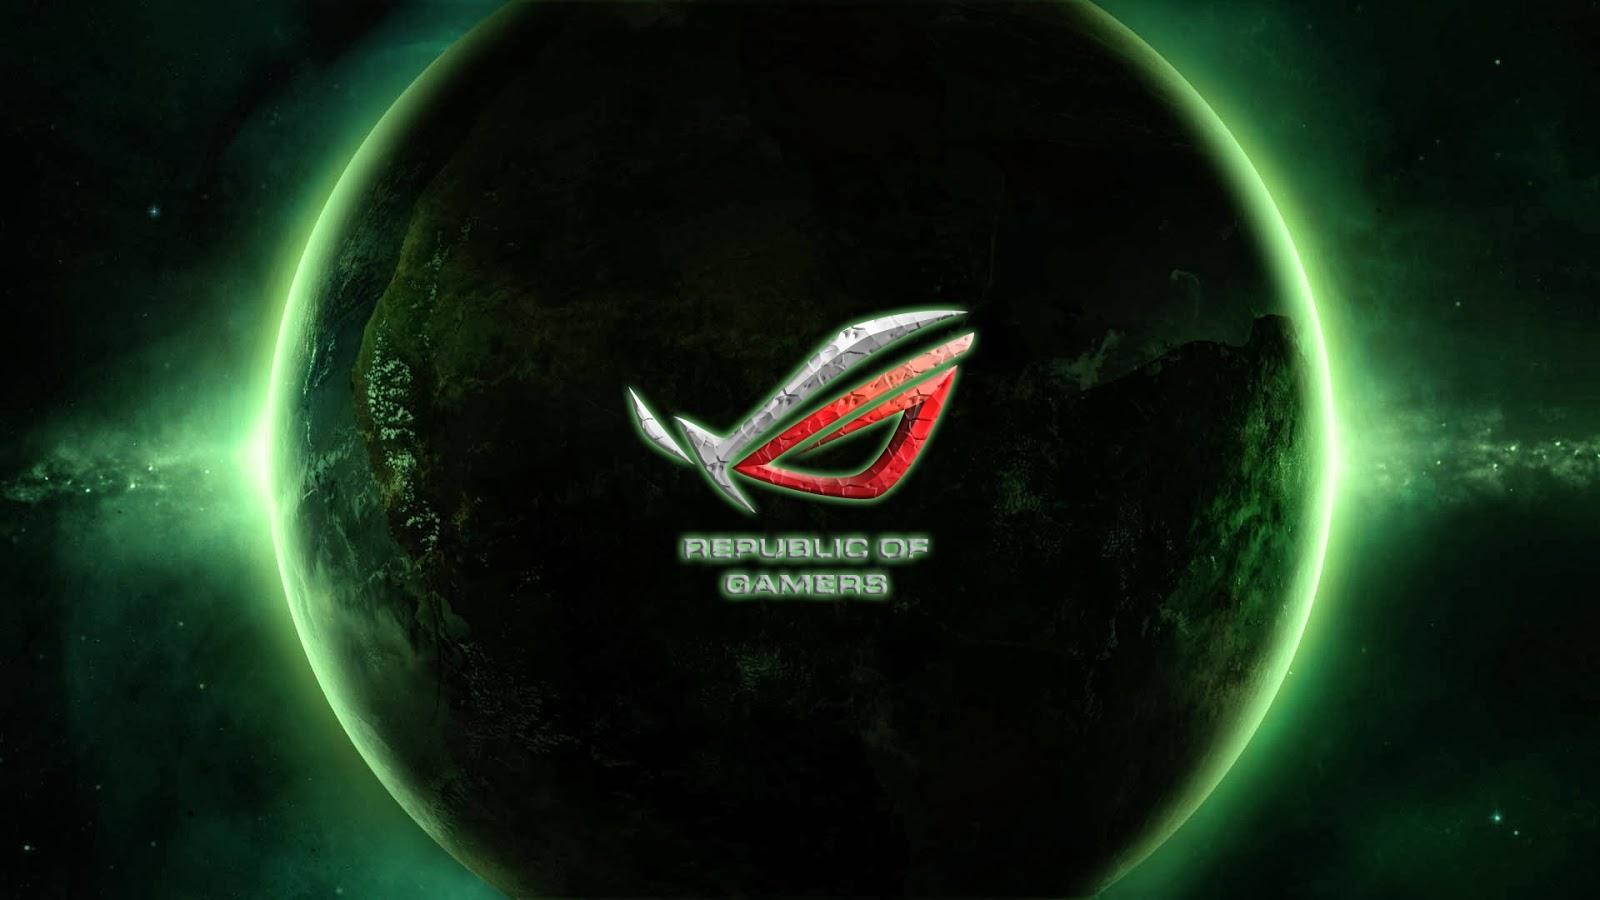 Asu Republic of Gamers Logo Brand Space Planet Widescreen HD Wallpaper 1600x900